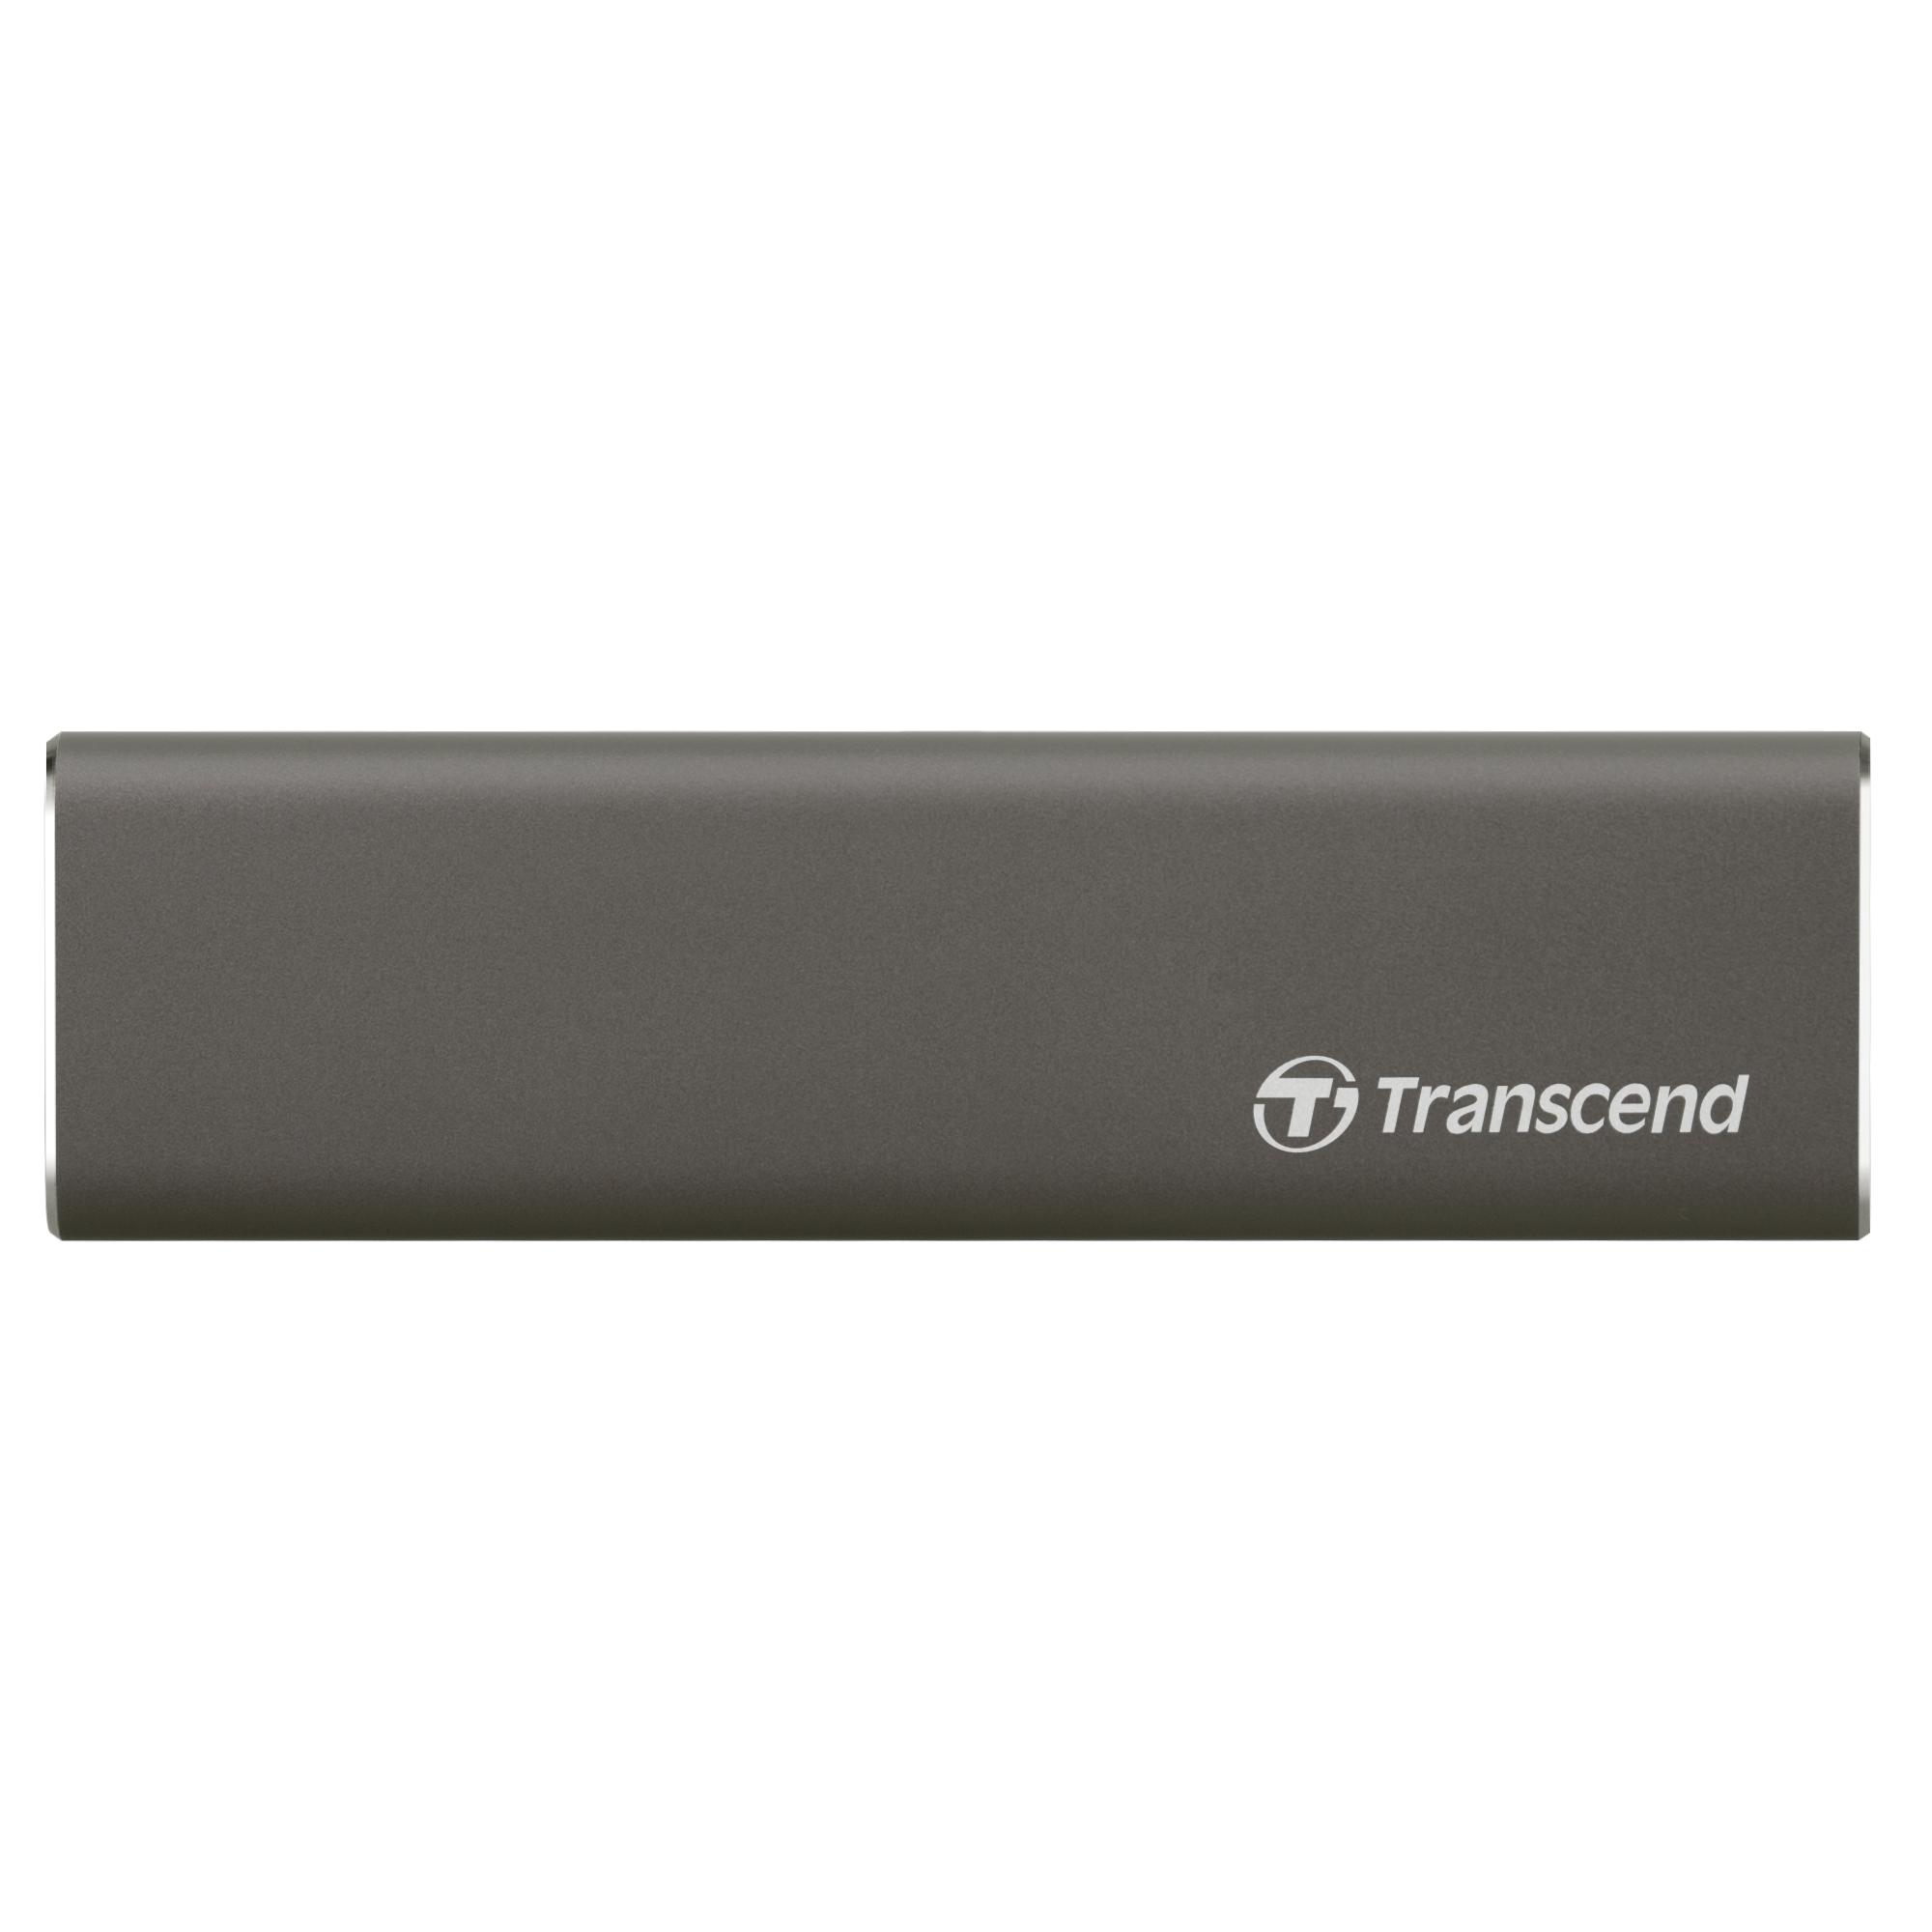 Mac專用行動儲存裝置-StoreJet® 600行動固態硬碟 / 創見資訊股份有限公司